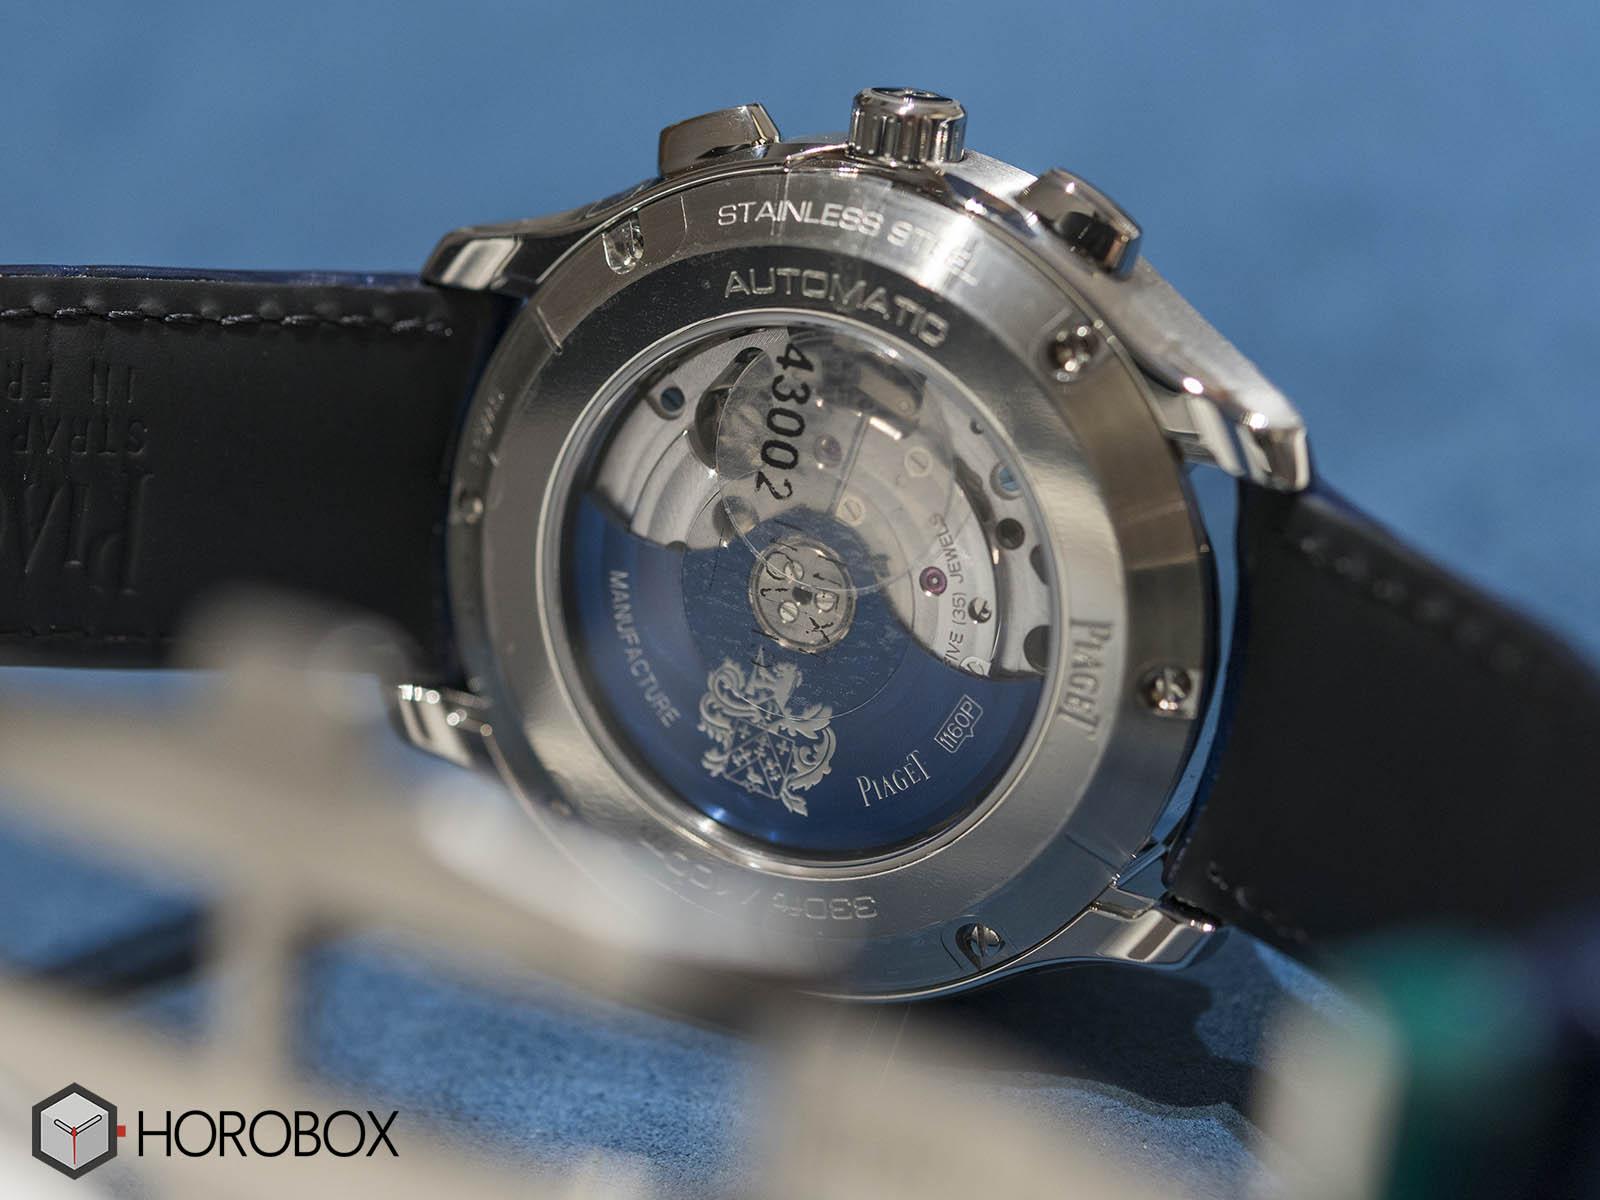 piaget-polo-s-chronograph-sihh-2018-7.jpg